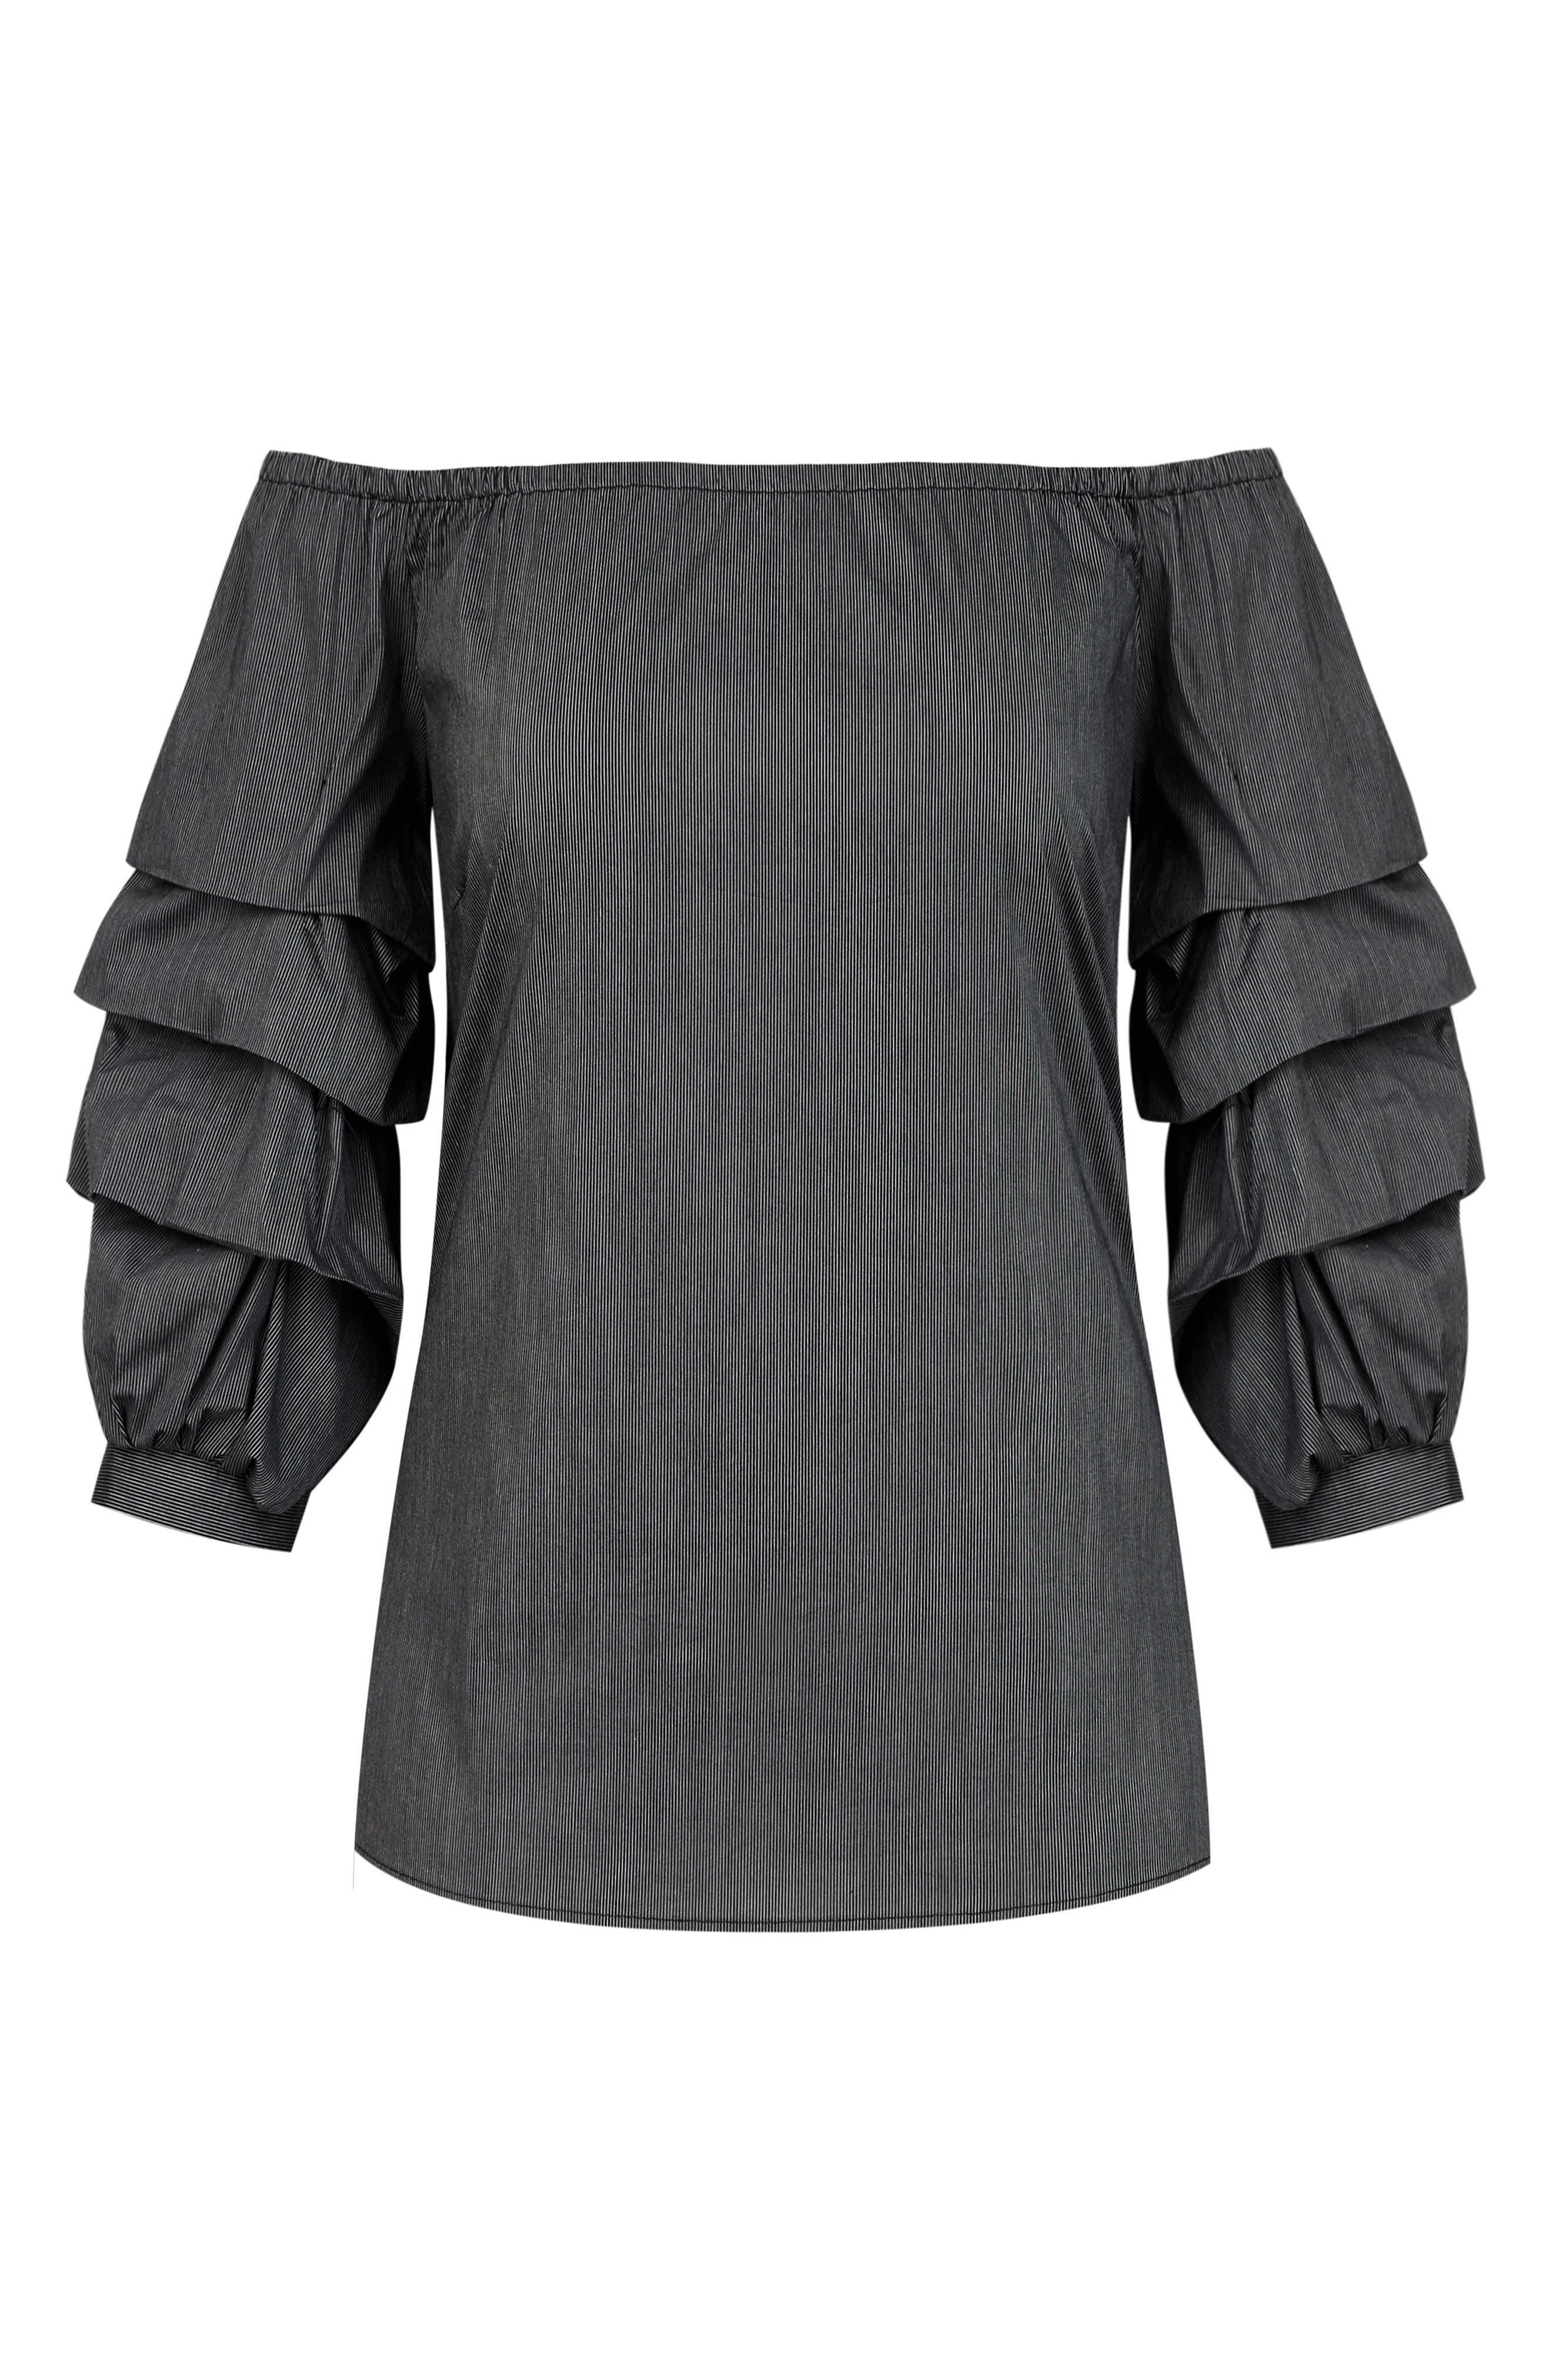 Fancy Sleeve Off the Shoulder Cotton Blend Top,                             Alternate thumbnail 4, color,                             Black Stripe